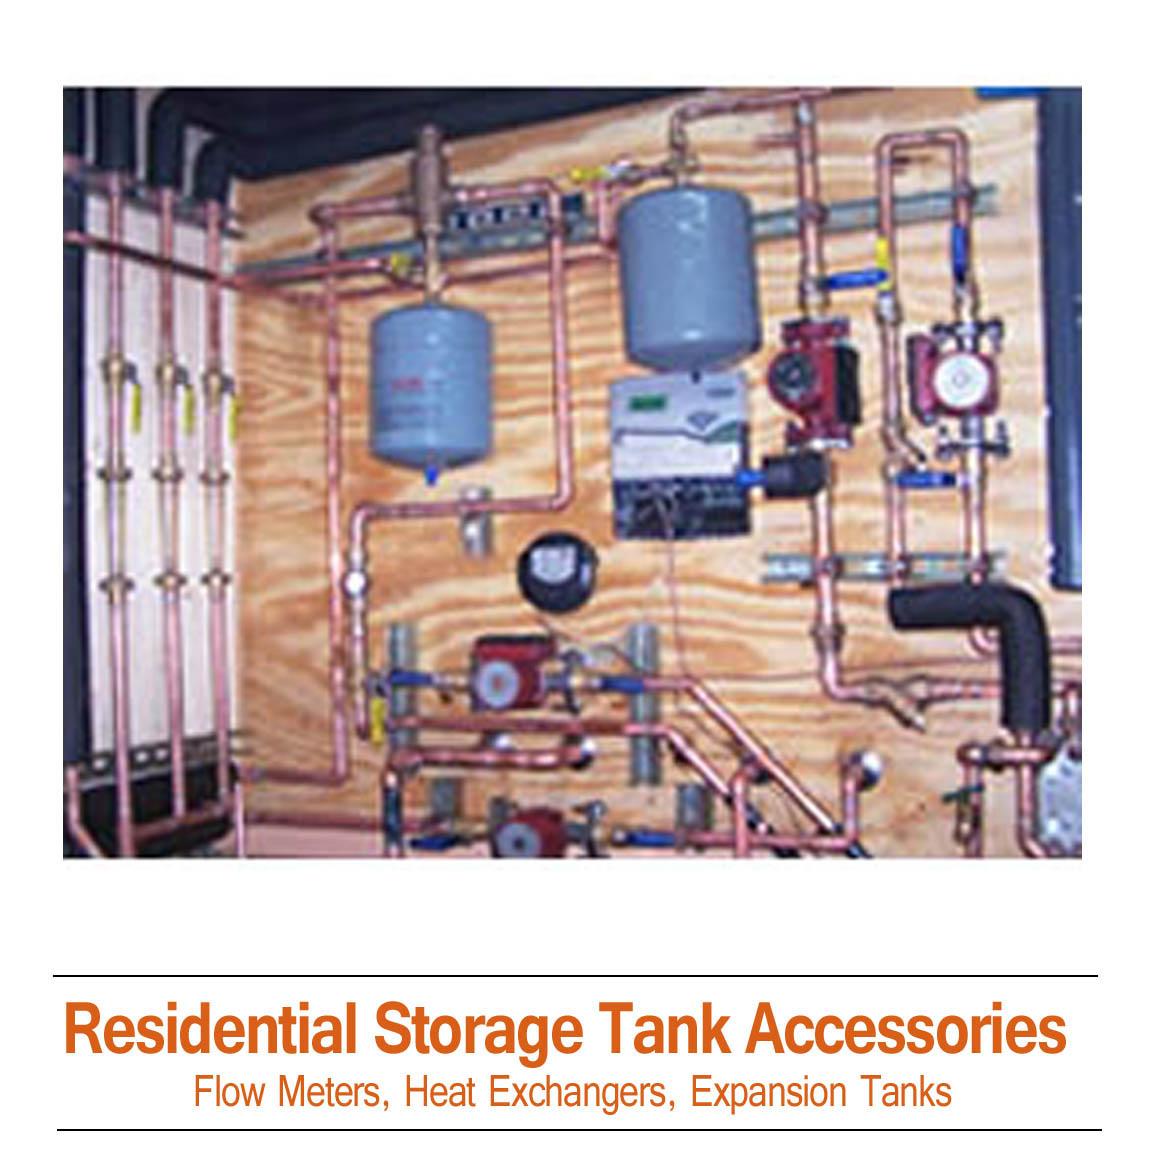 Residential Storage Tank Accessories